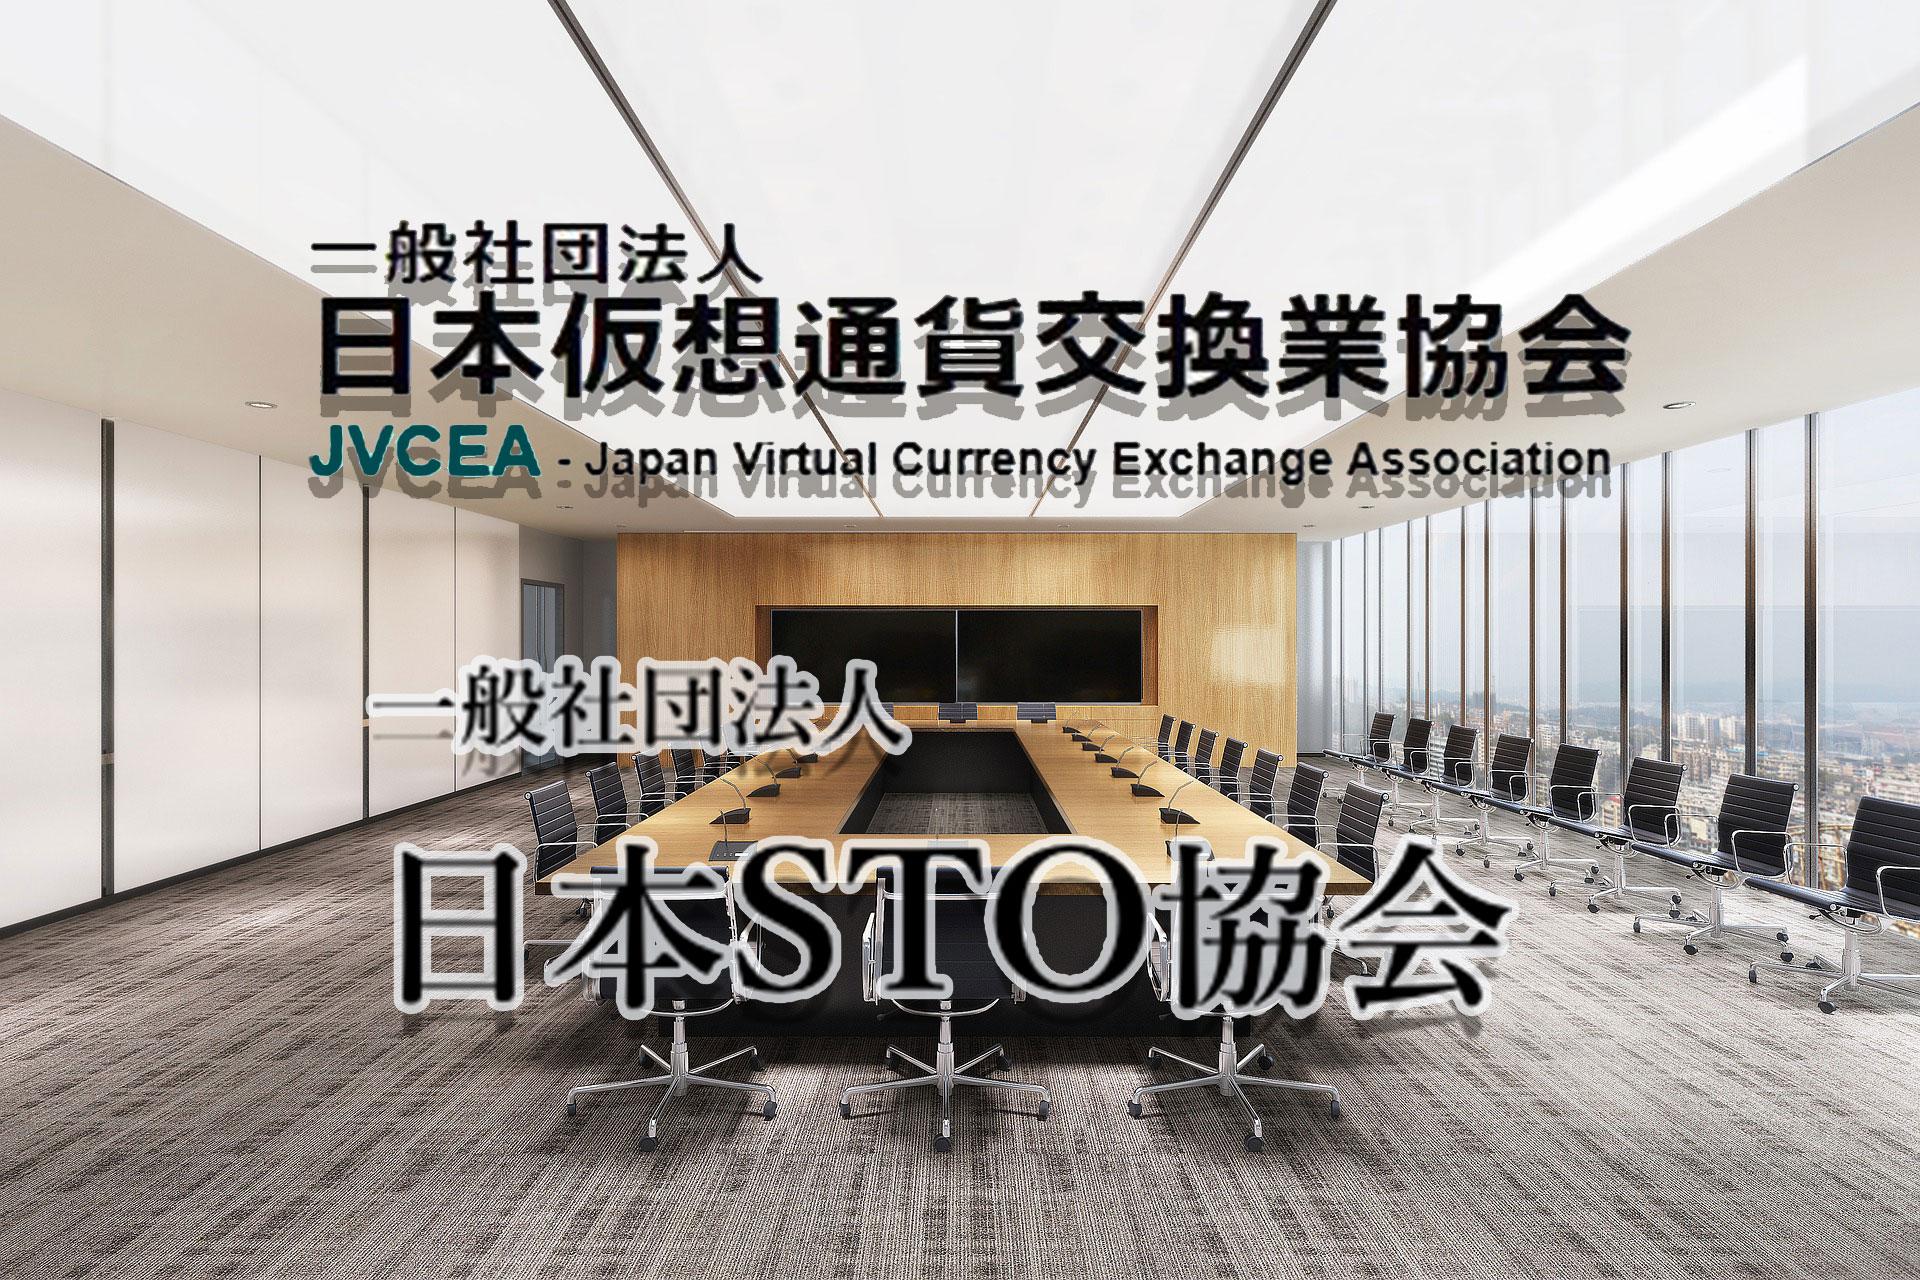 JVCEAと日本STO協会を「金融商品取引業協会」に認定:金融庁